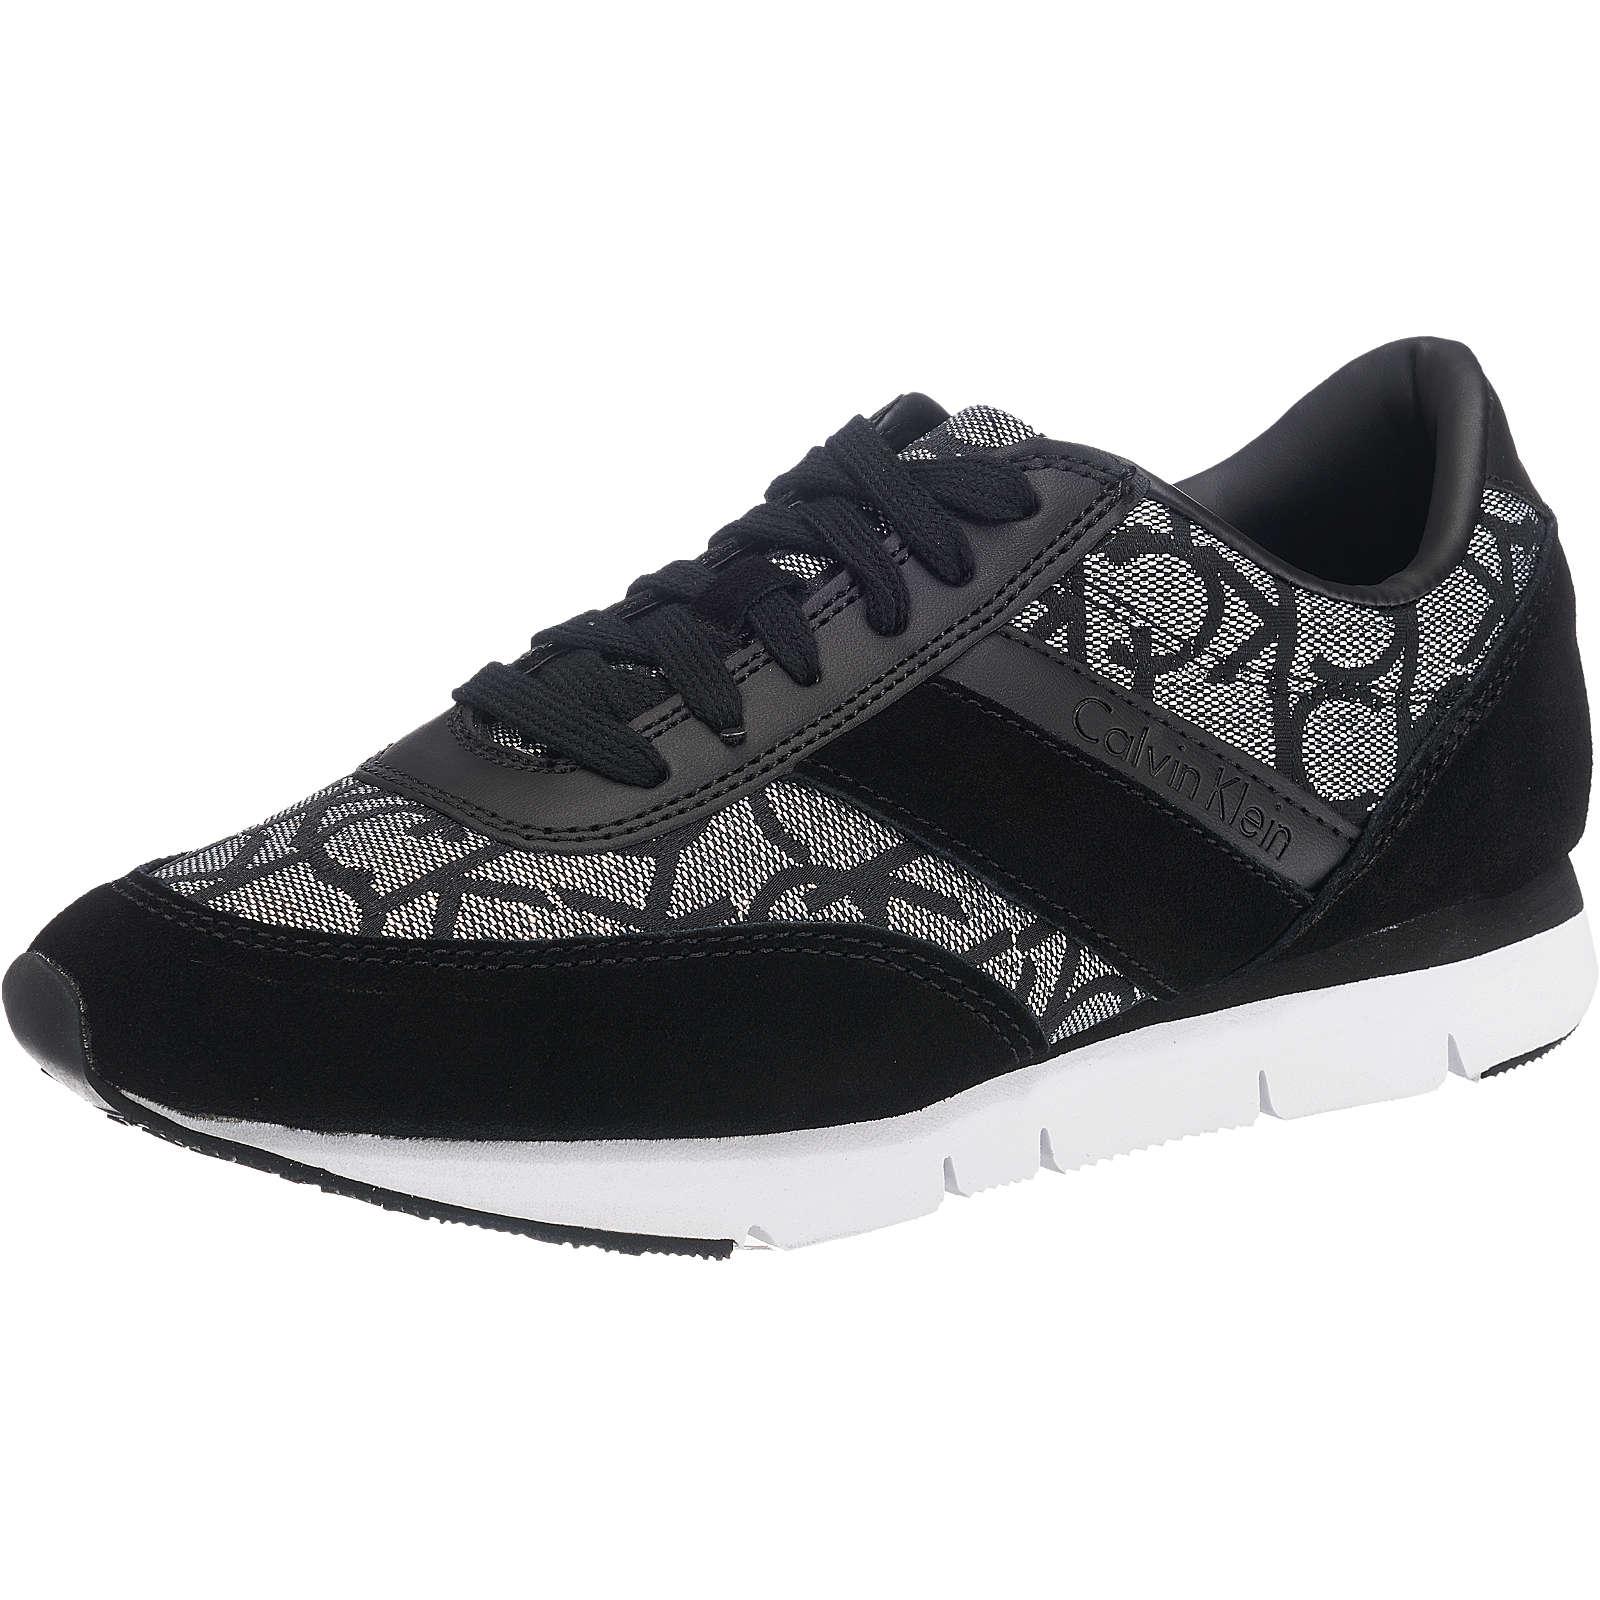 CALVIN KLEIN JEANS Sneakers schwarz-kombi Damen Gr. 37